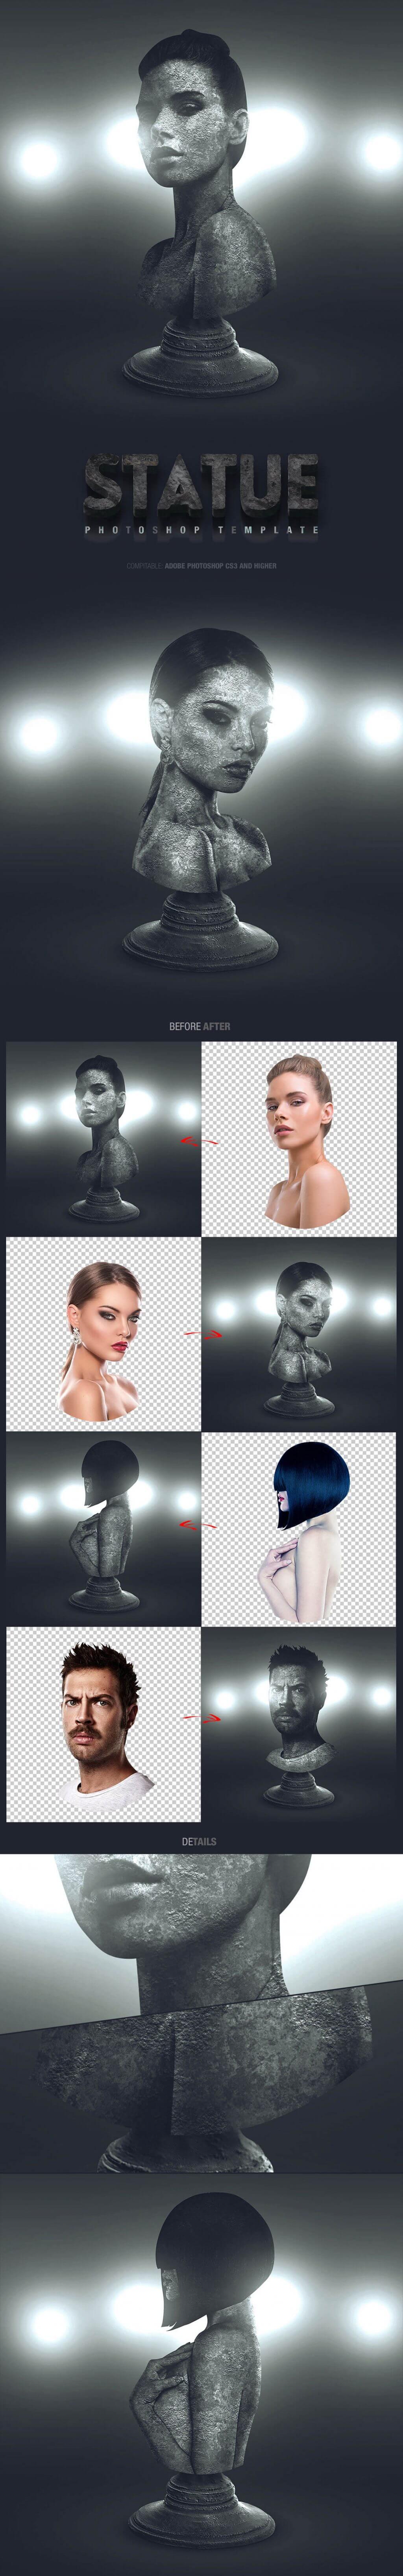 Statue Photoshop Template Design